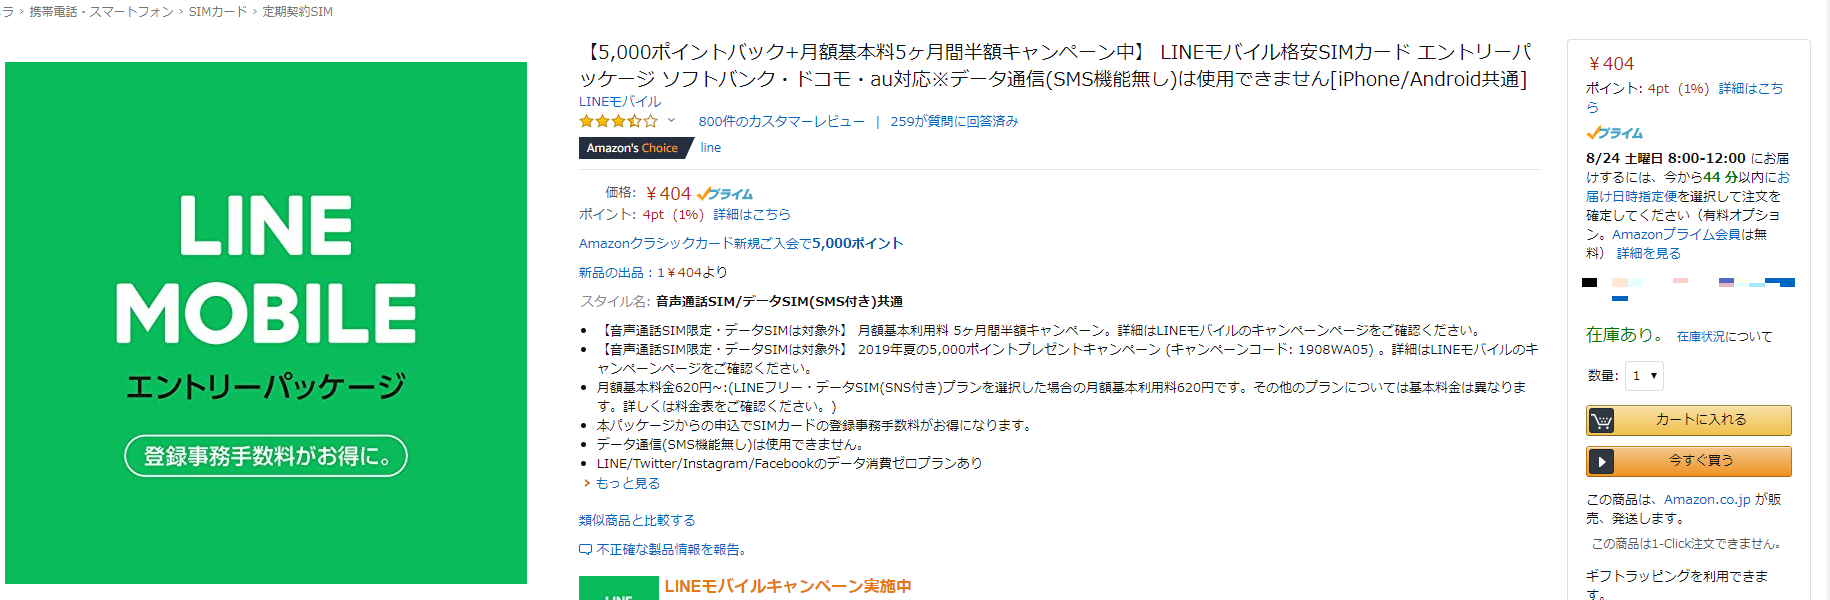 Amazonで販売されているエントリーパッケージ